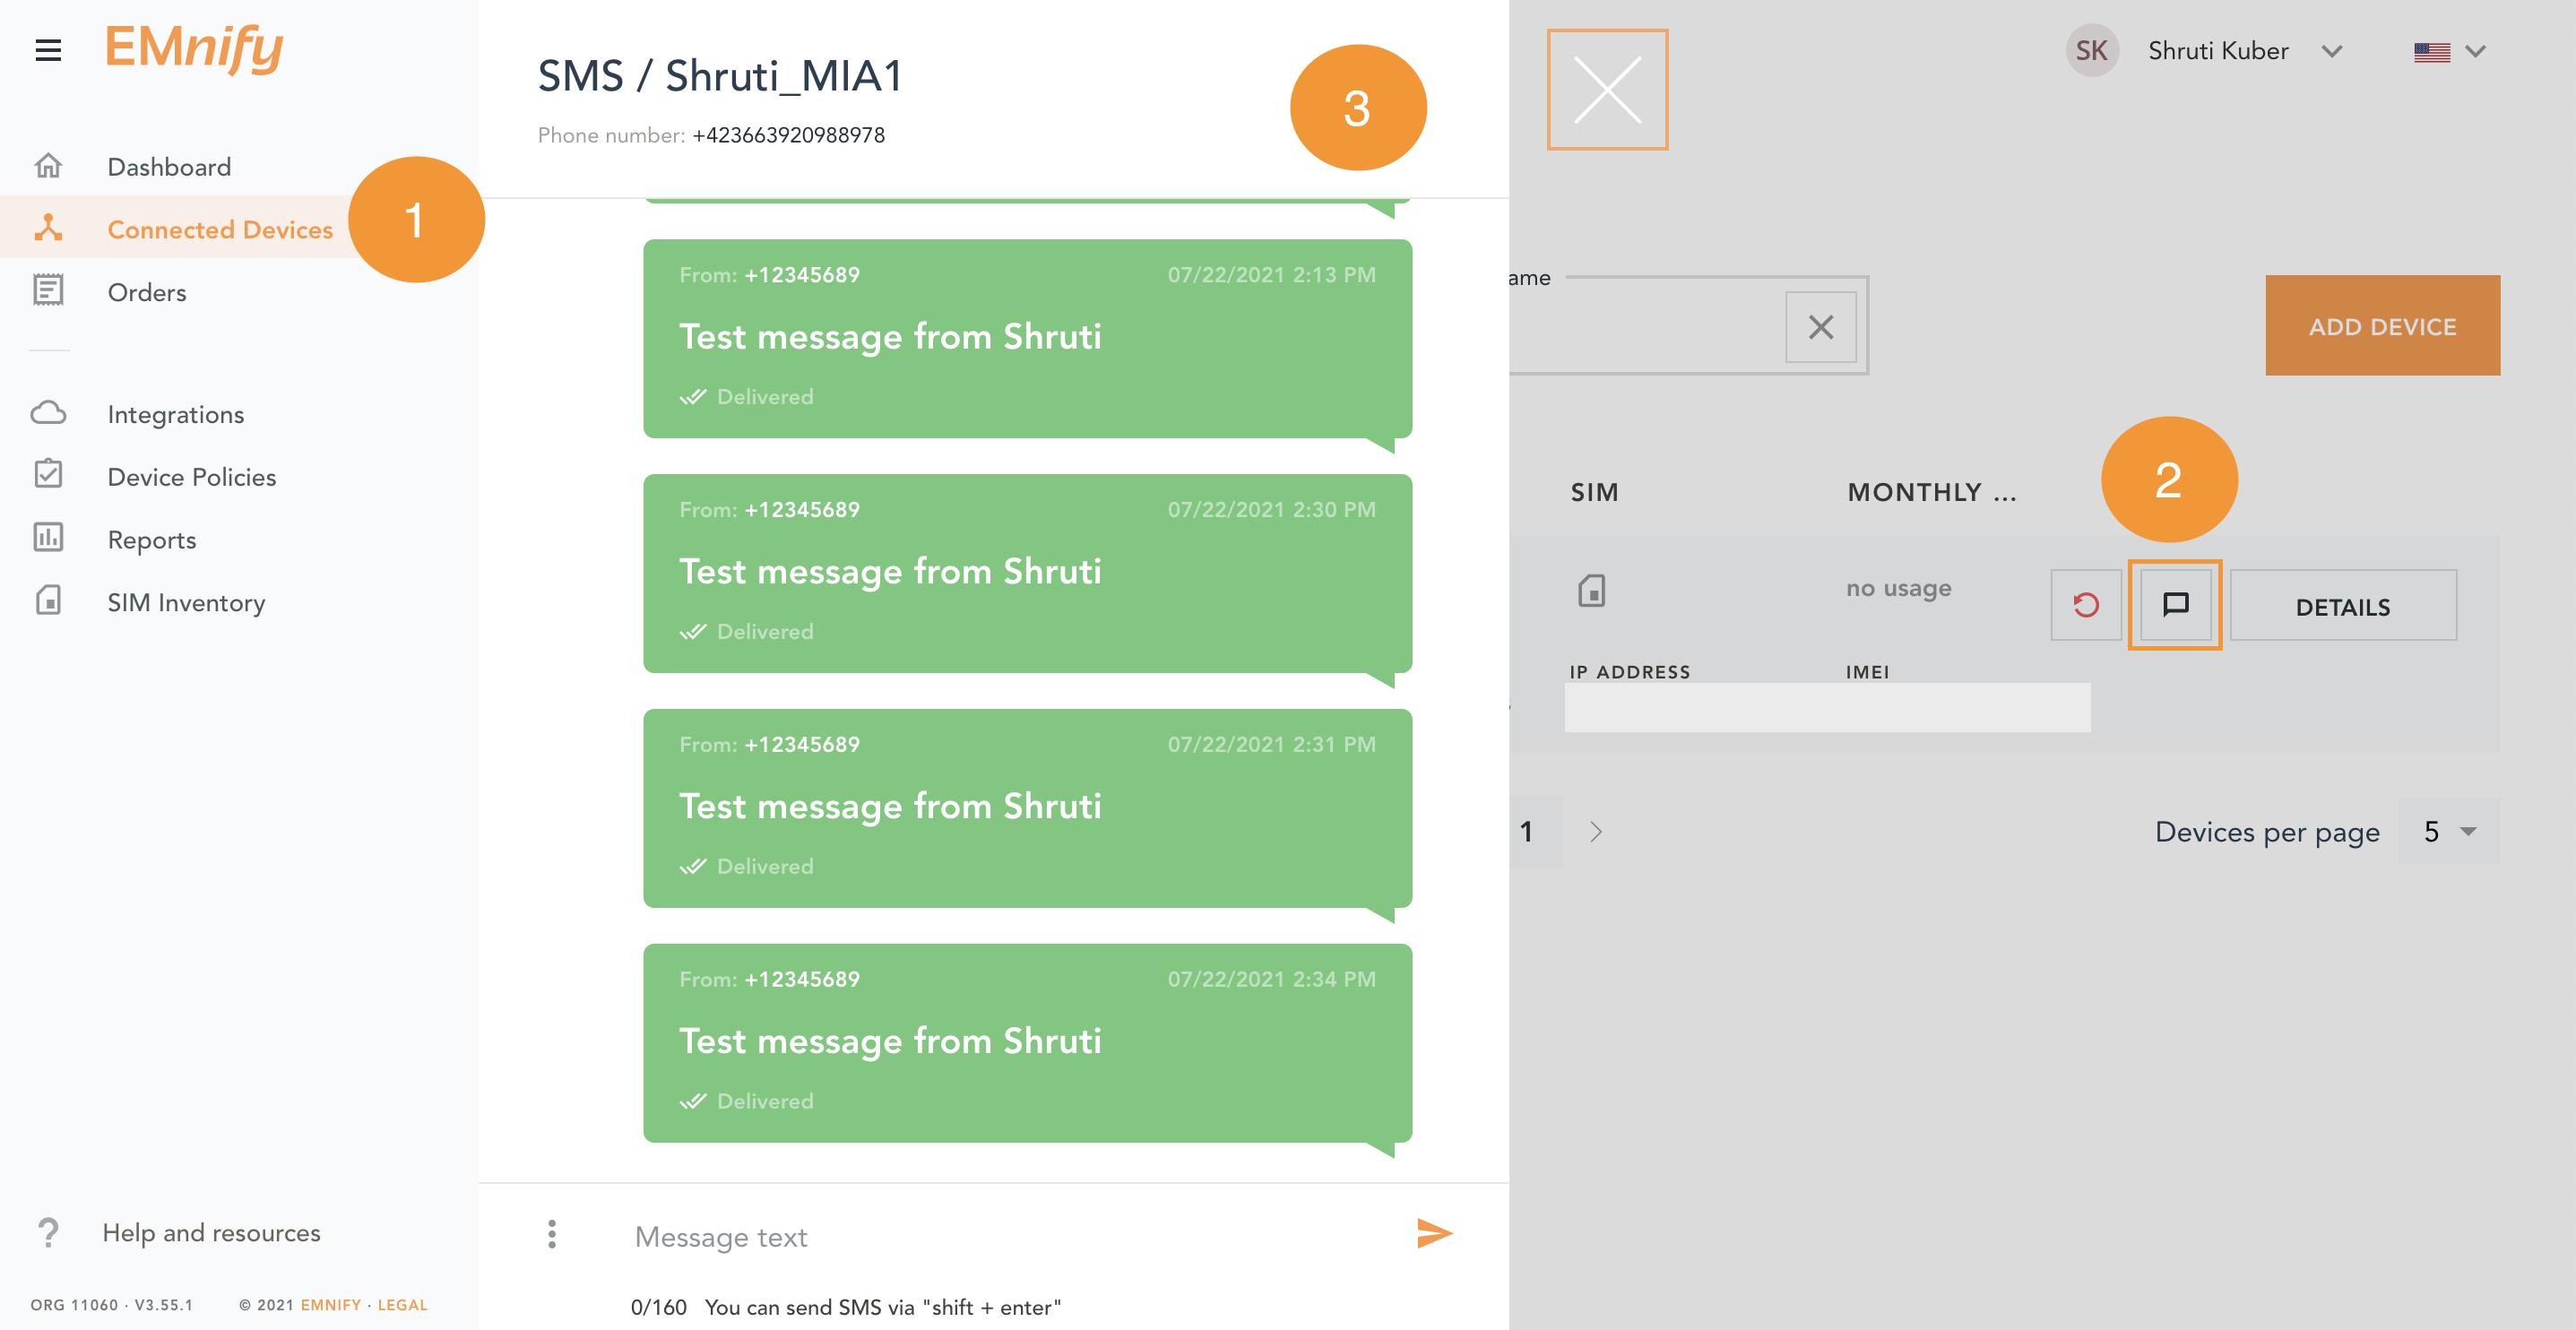 Check SMS in portal